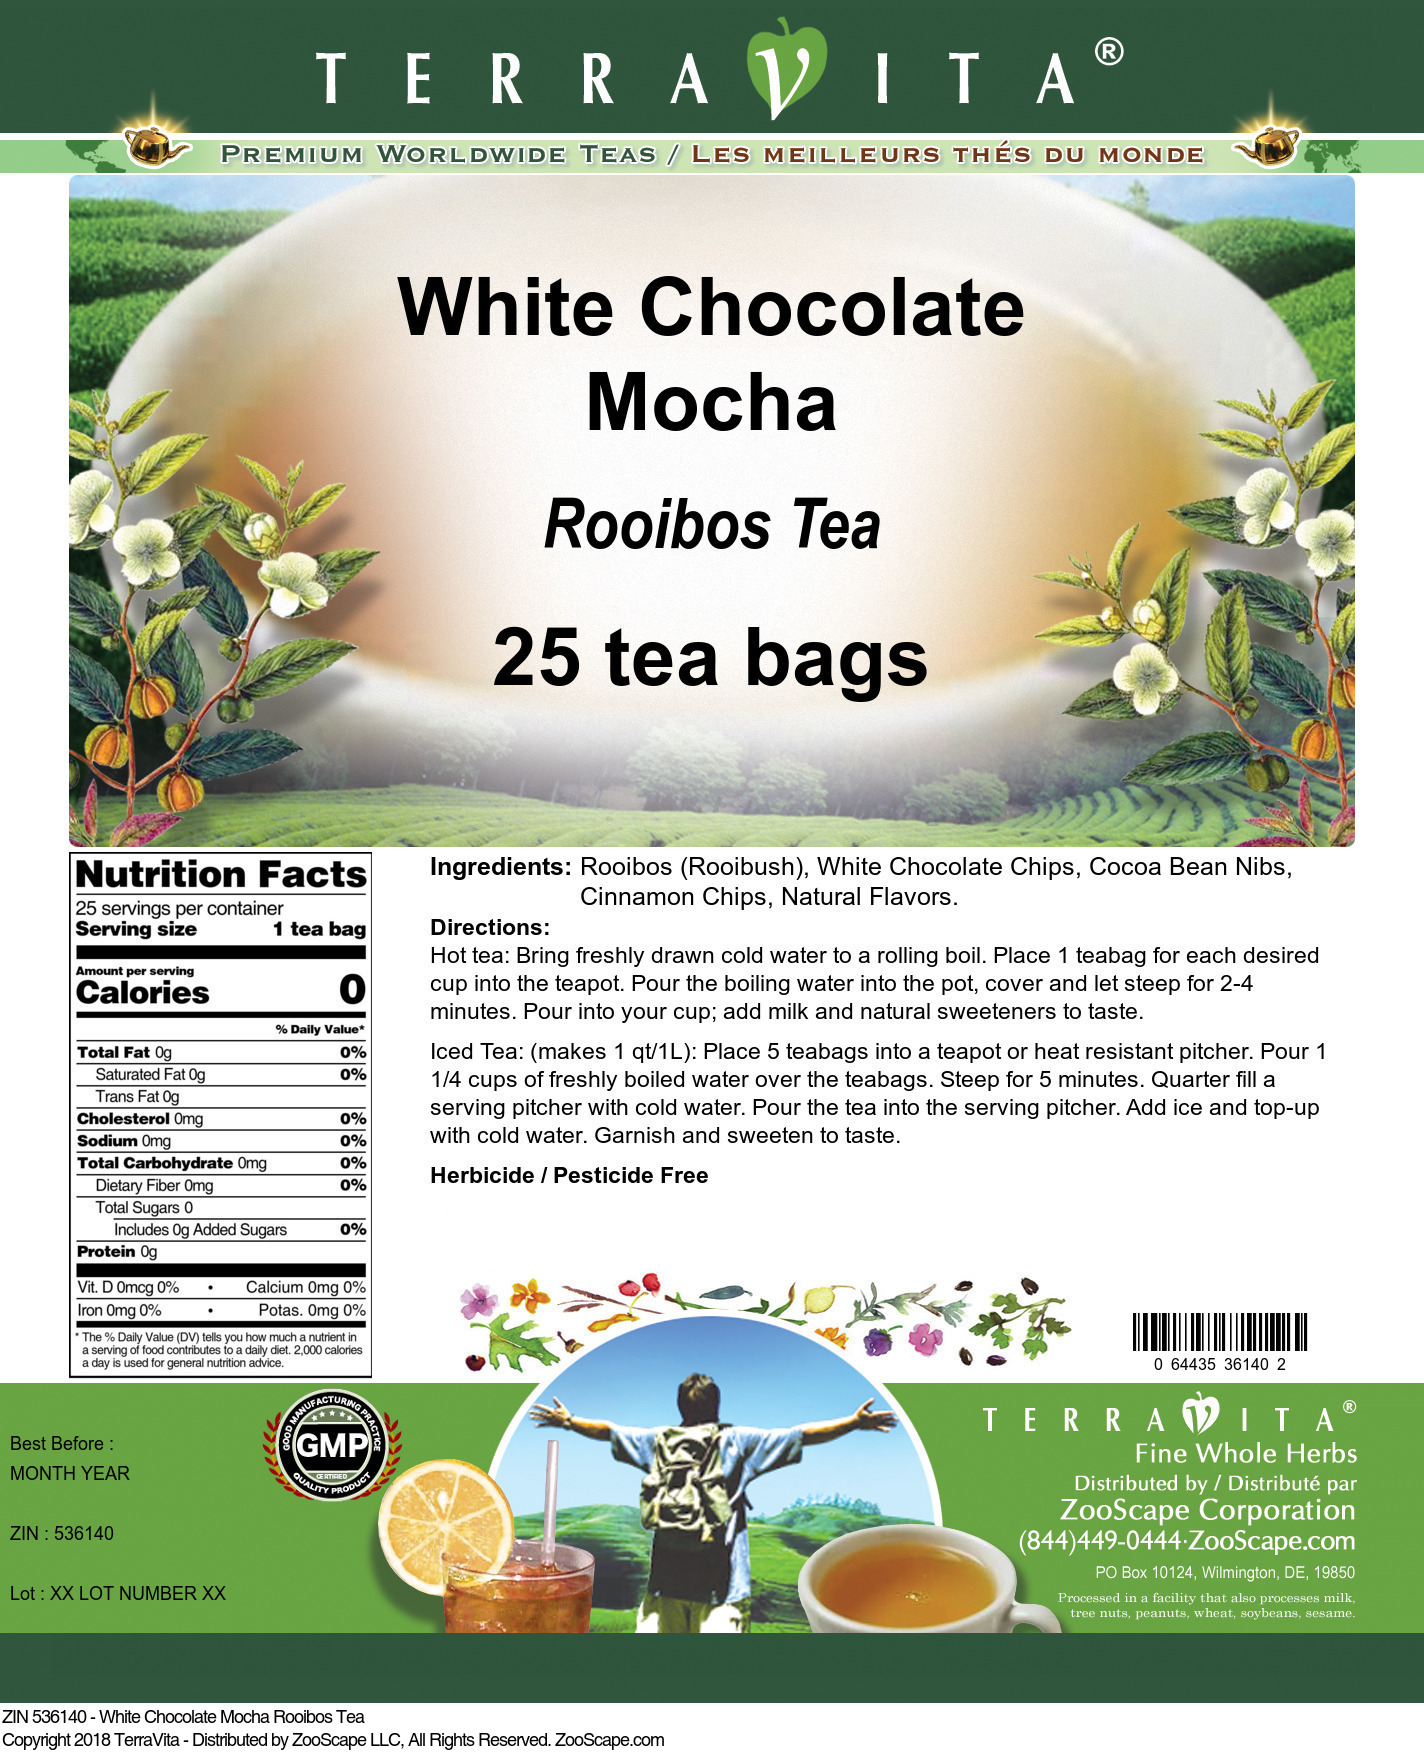 White Chocolate Mocha Rooibos Tea